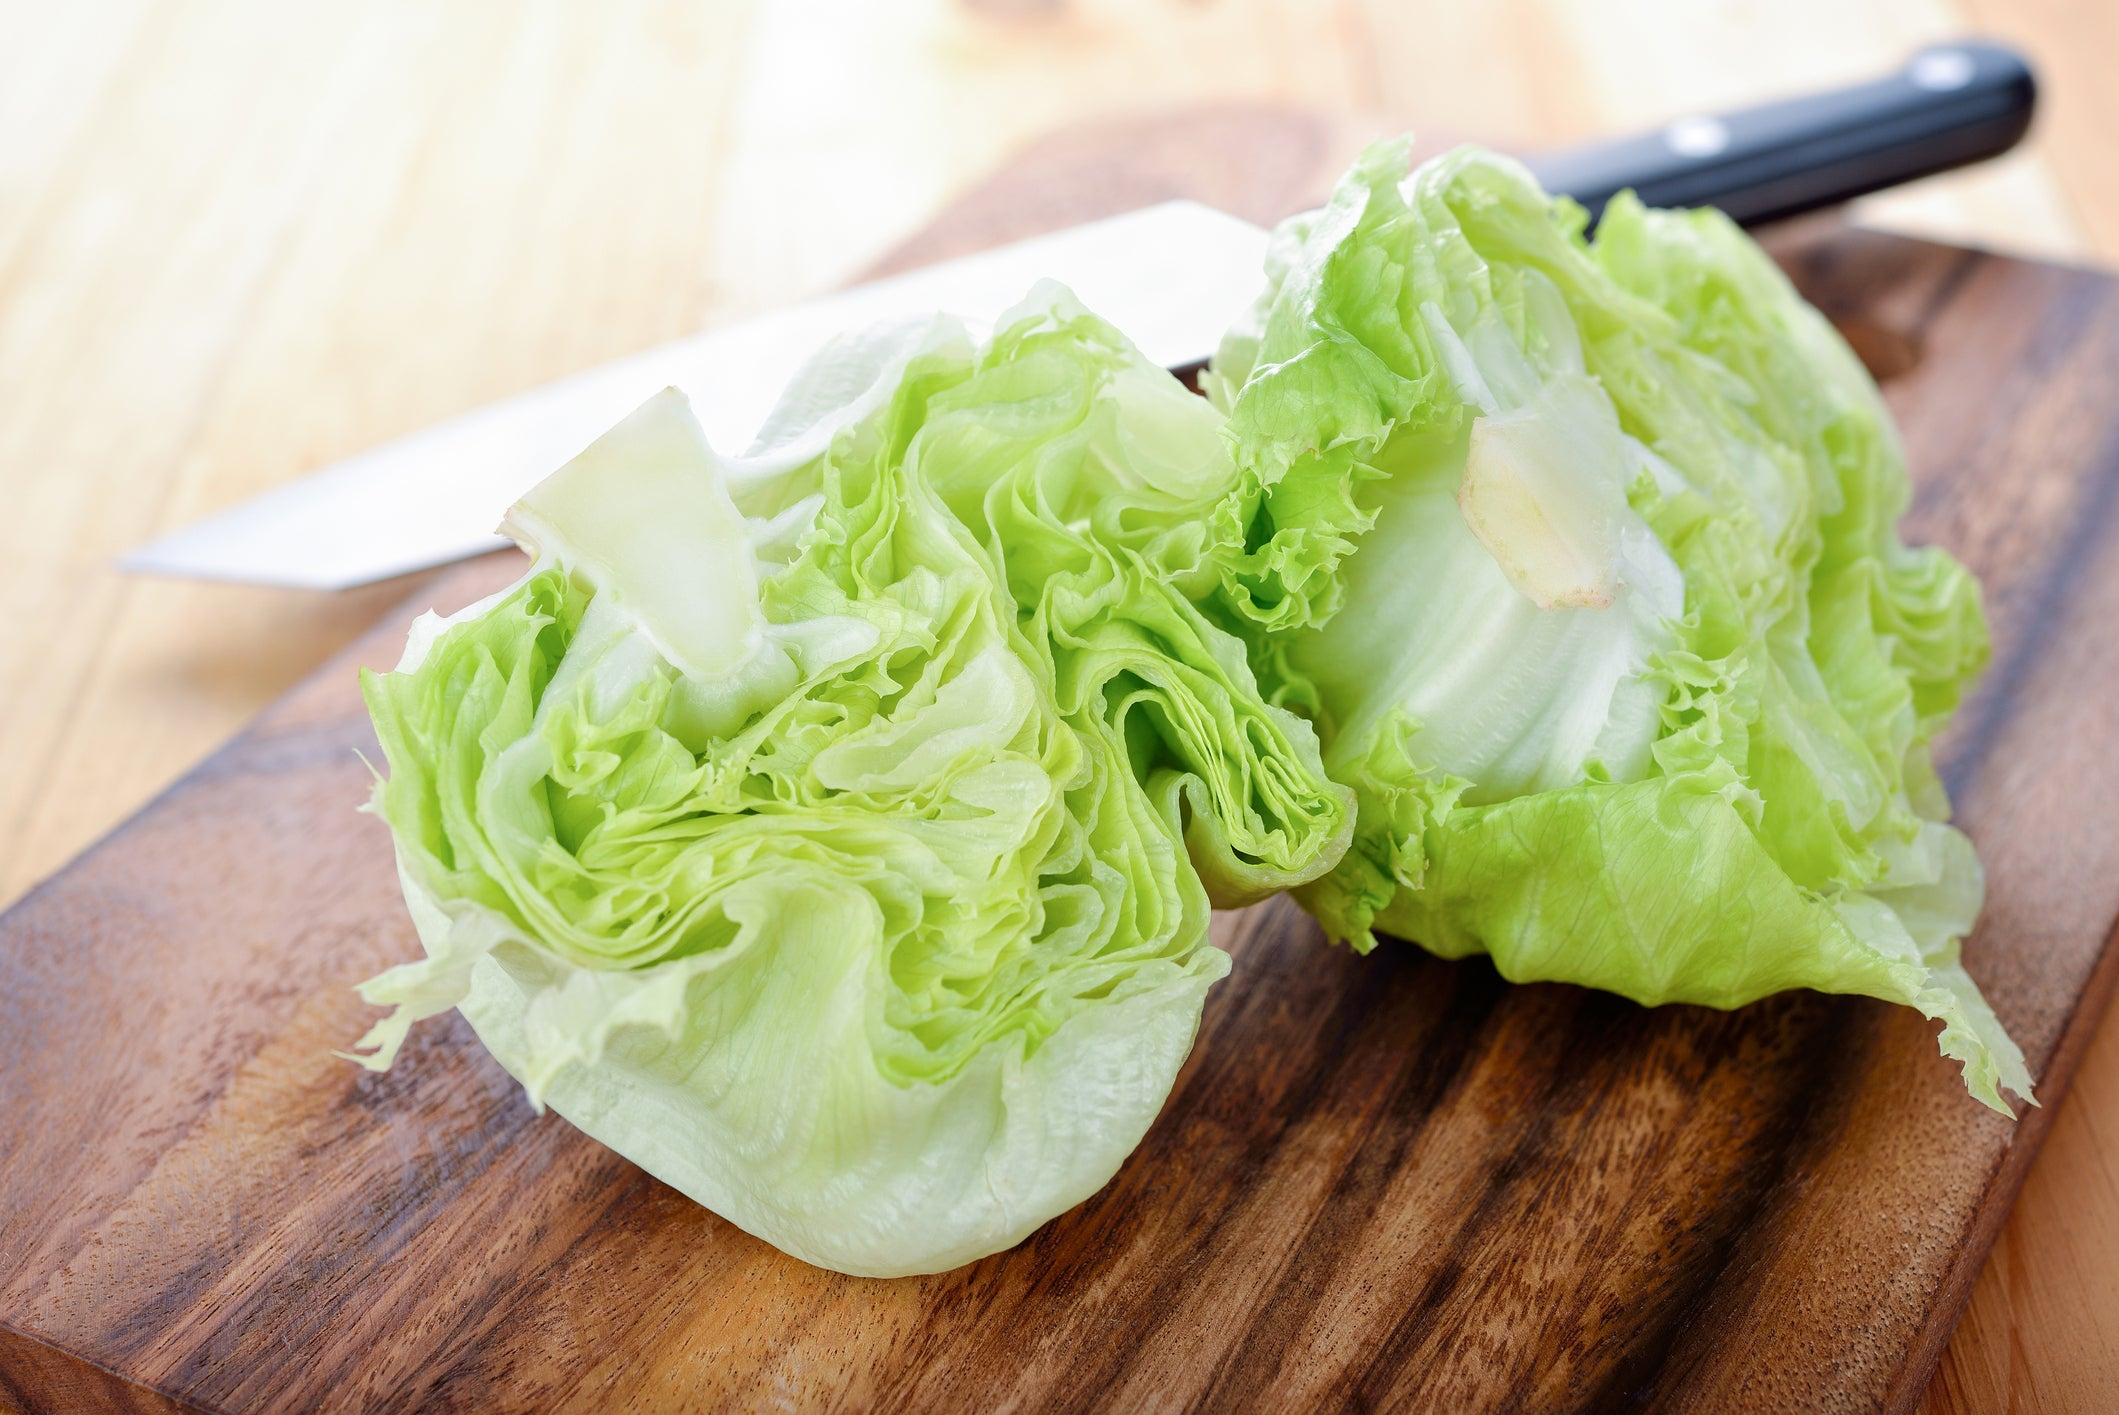 A head of iceberg lettuce, cut in half.